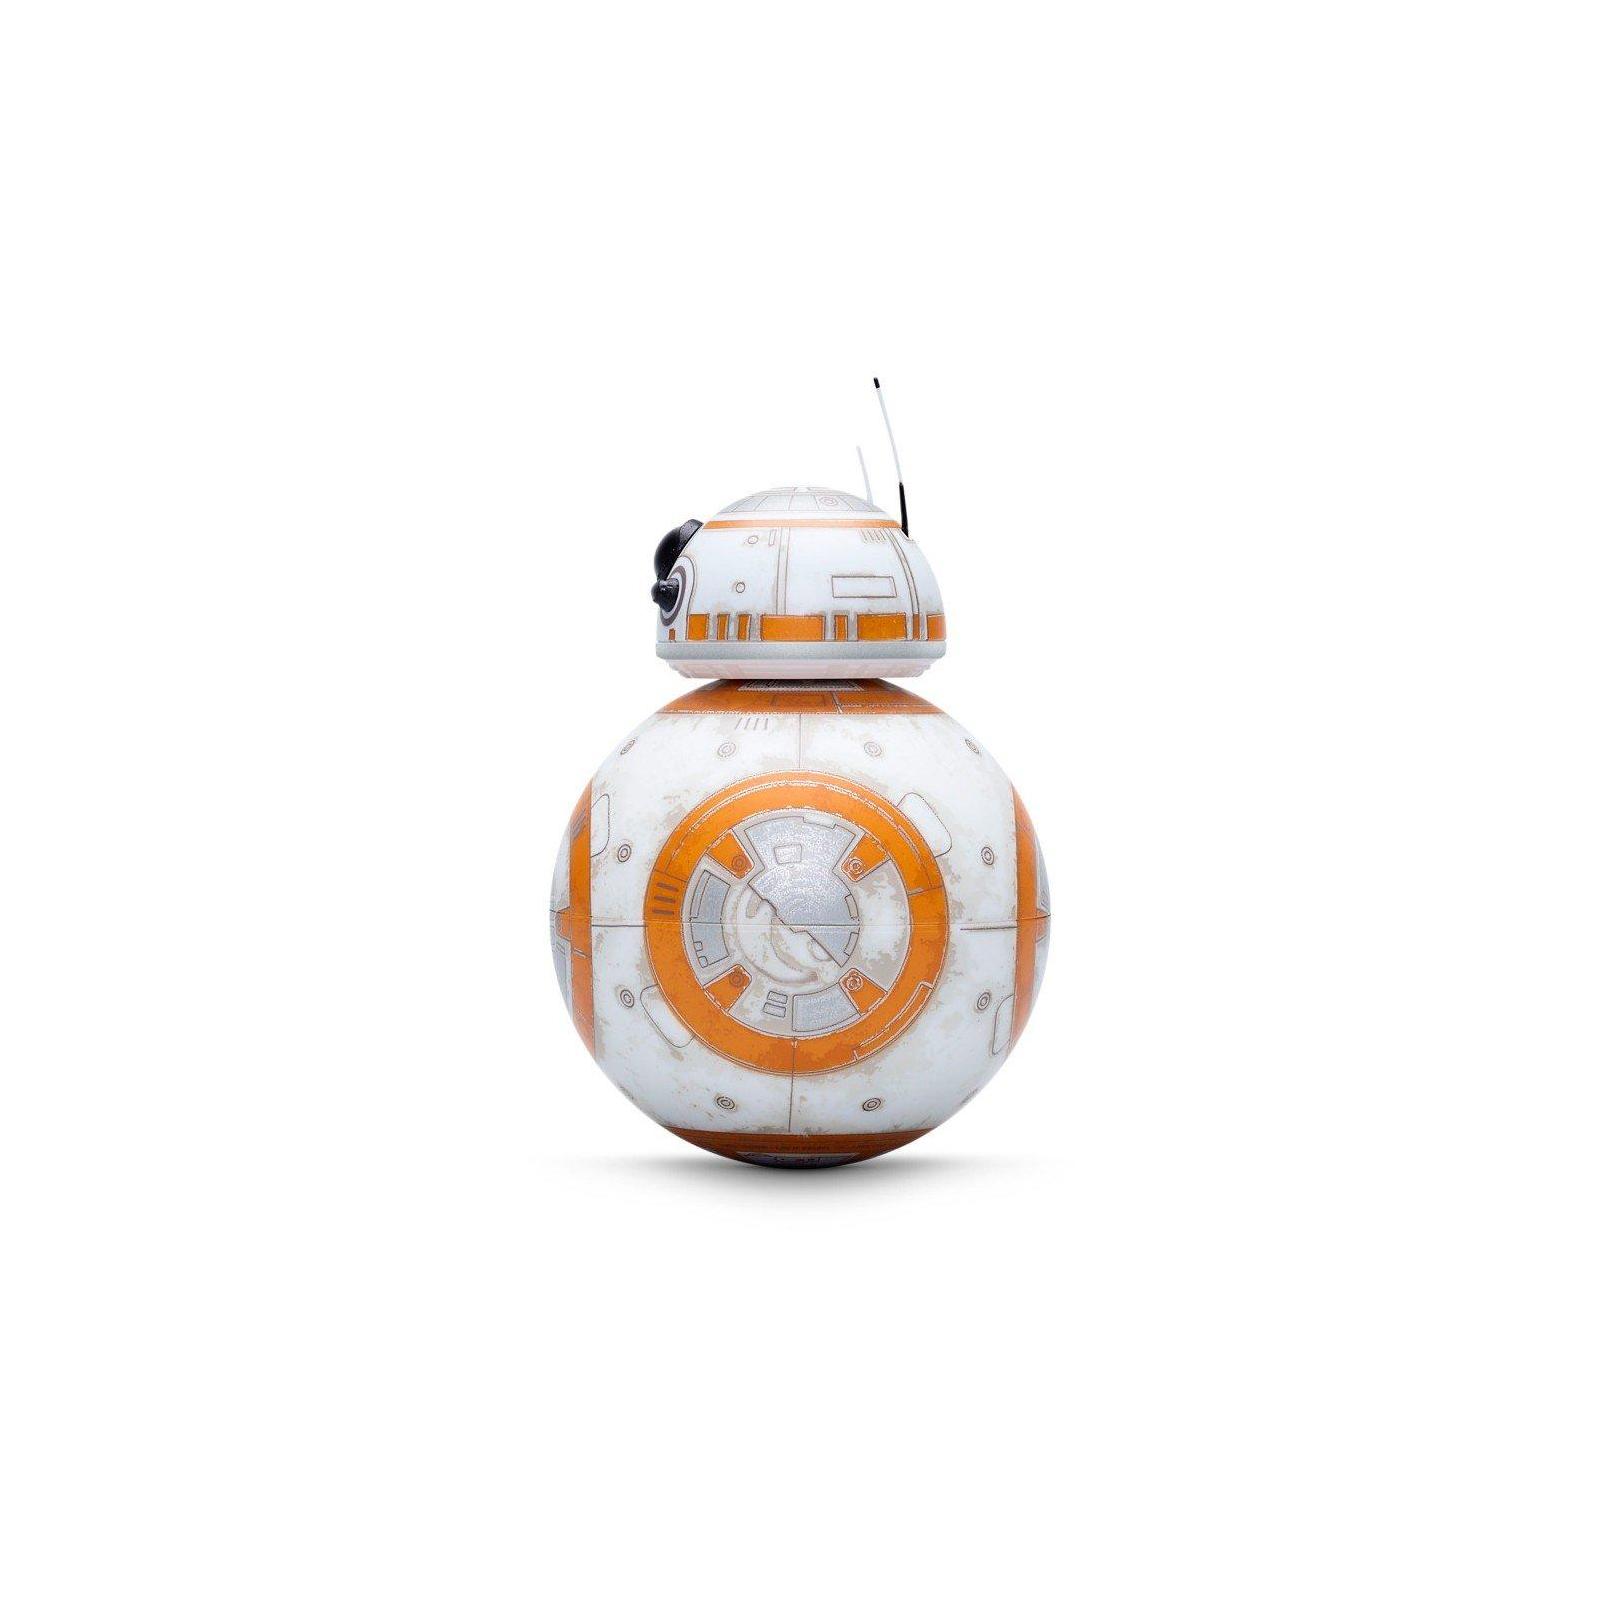 Робот Sphero BB-8 Special Edition with Force Band (322384) изображение 7